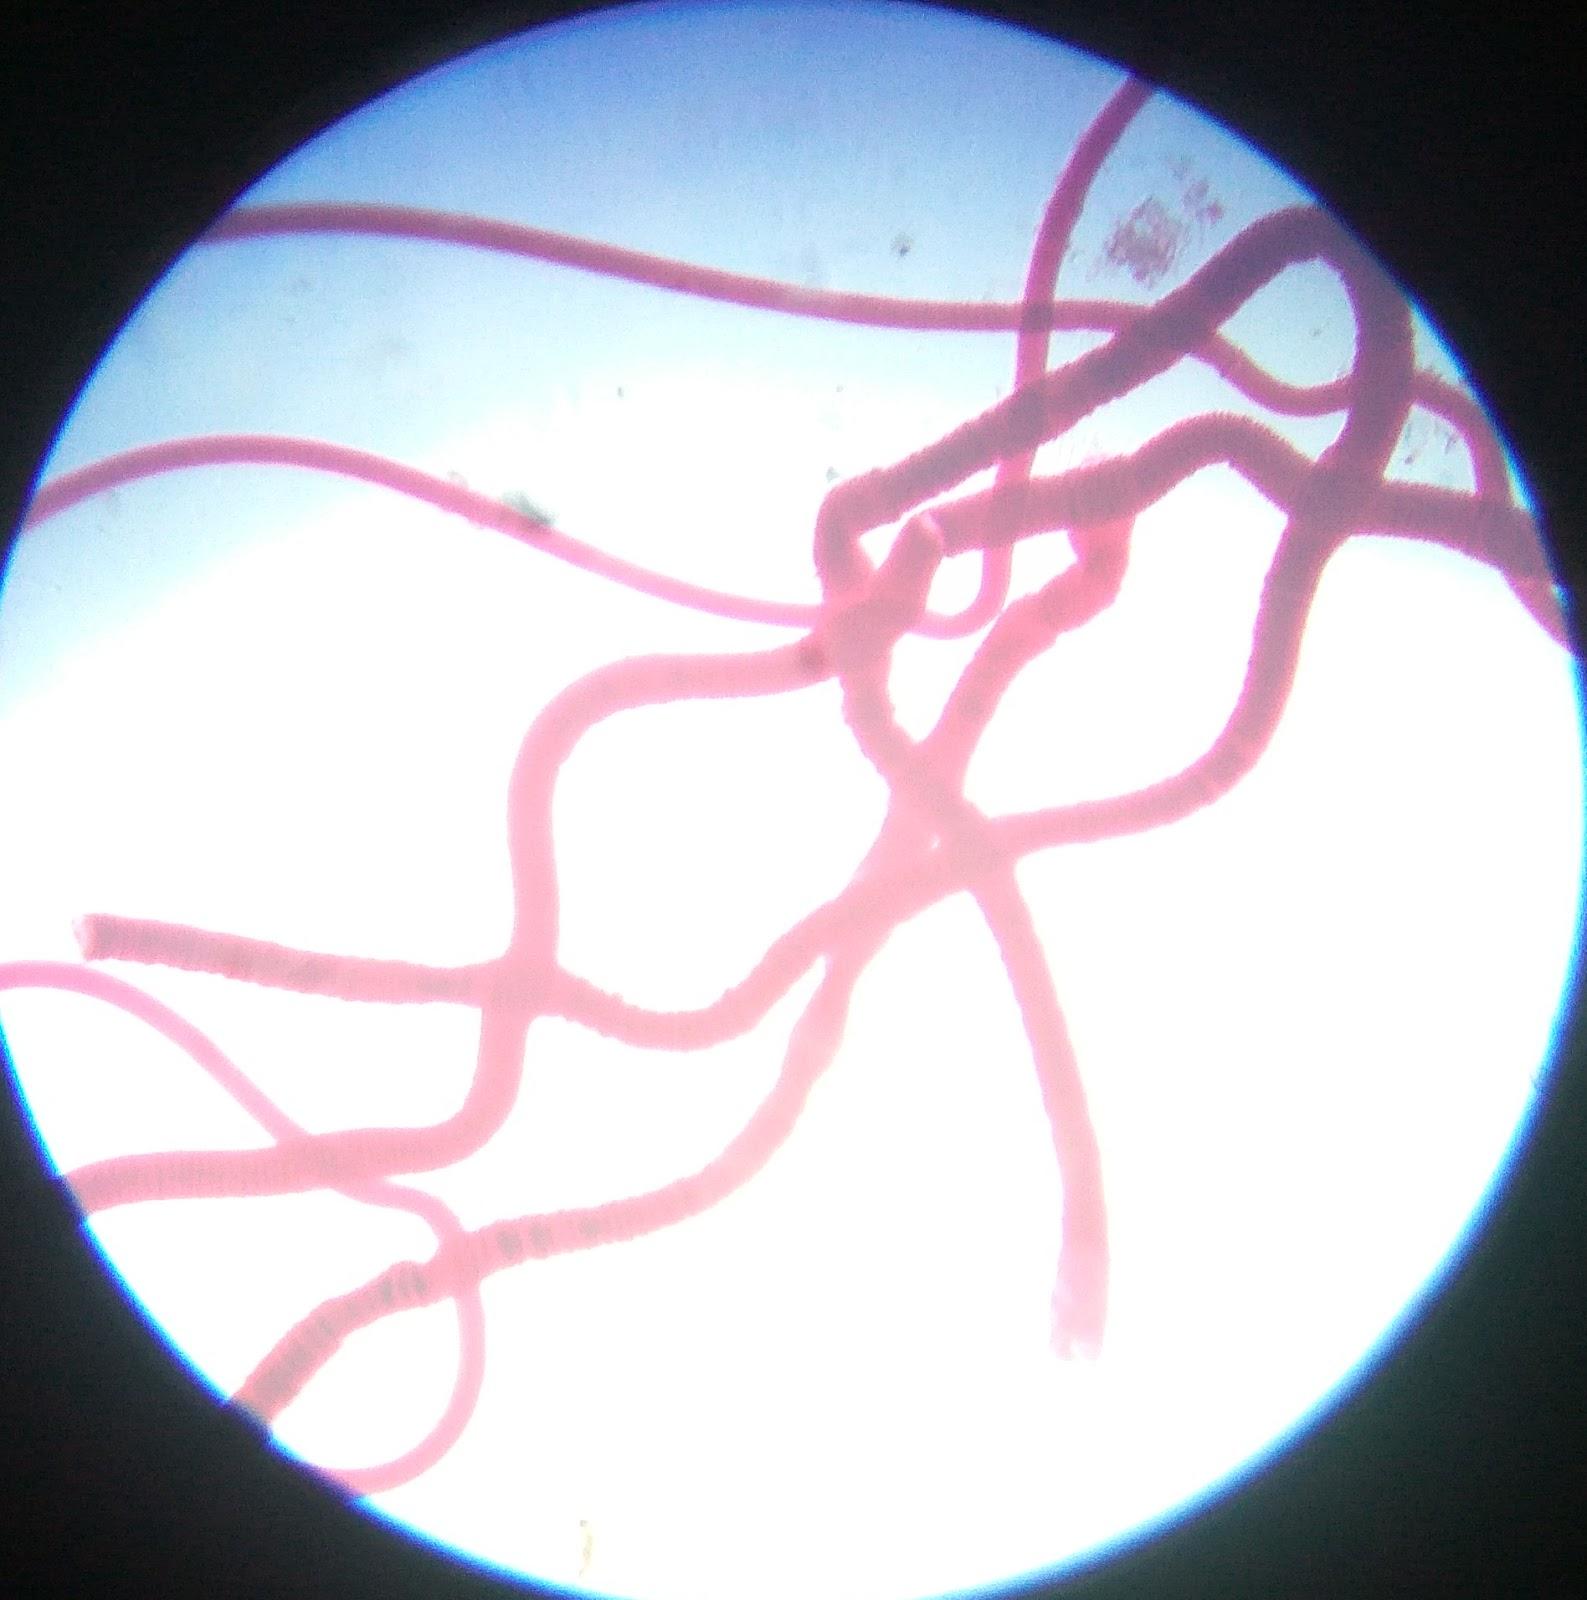 BOTANY TIMES: PRACTICAL EXAM-SPECIMENS SEEN UNDER MICROSCOPE